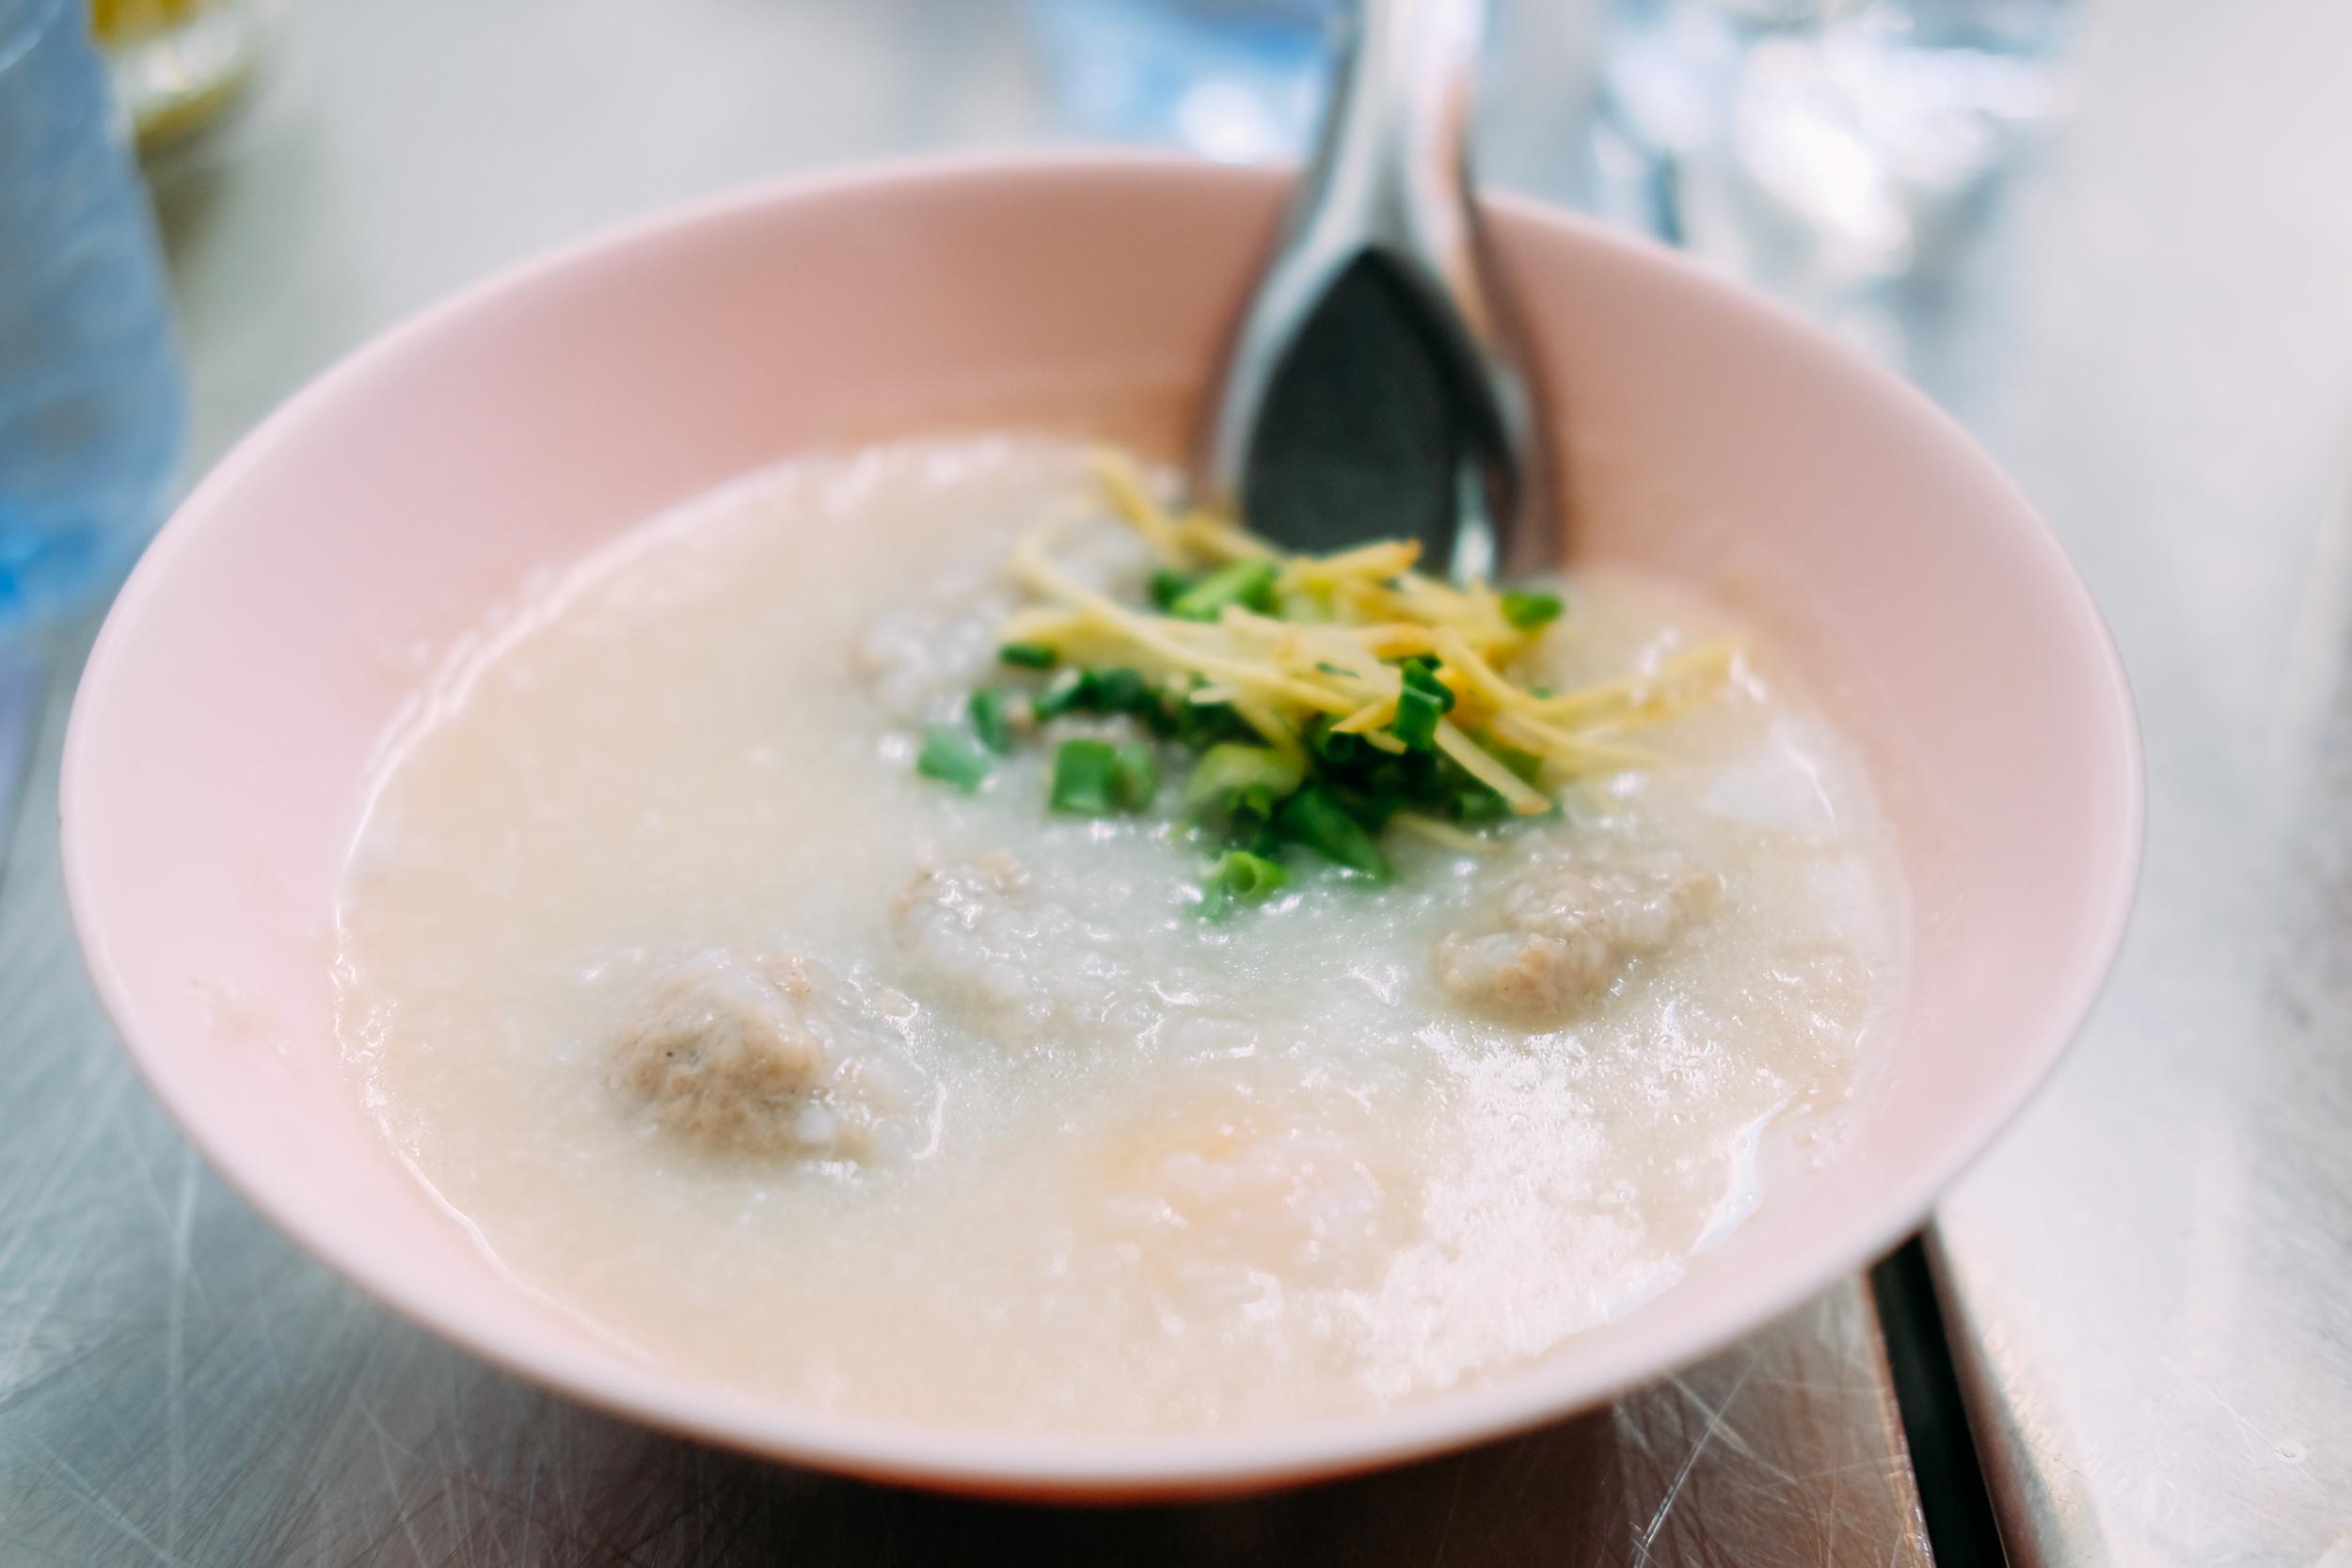 Porridge with pork balls. Yummy!